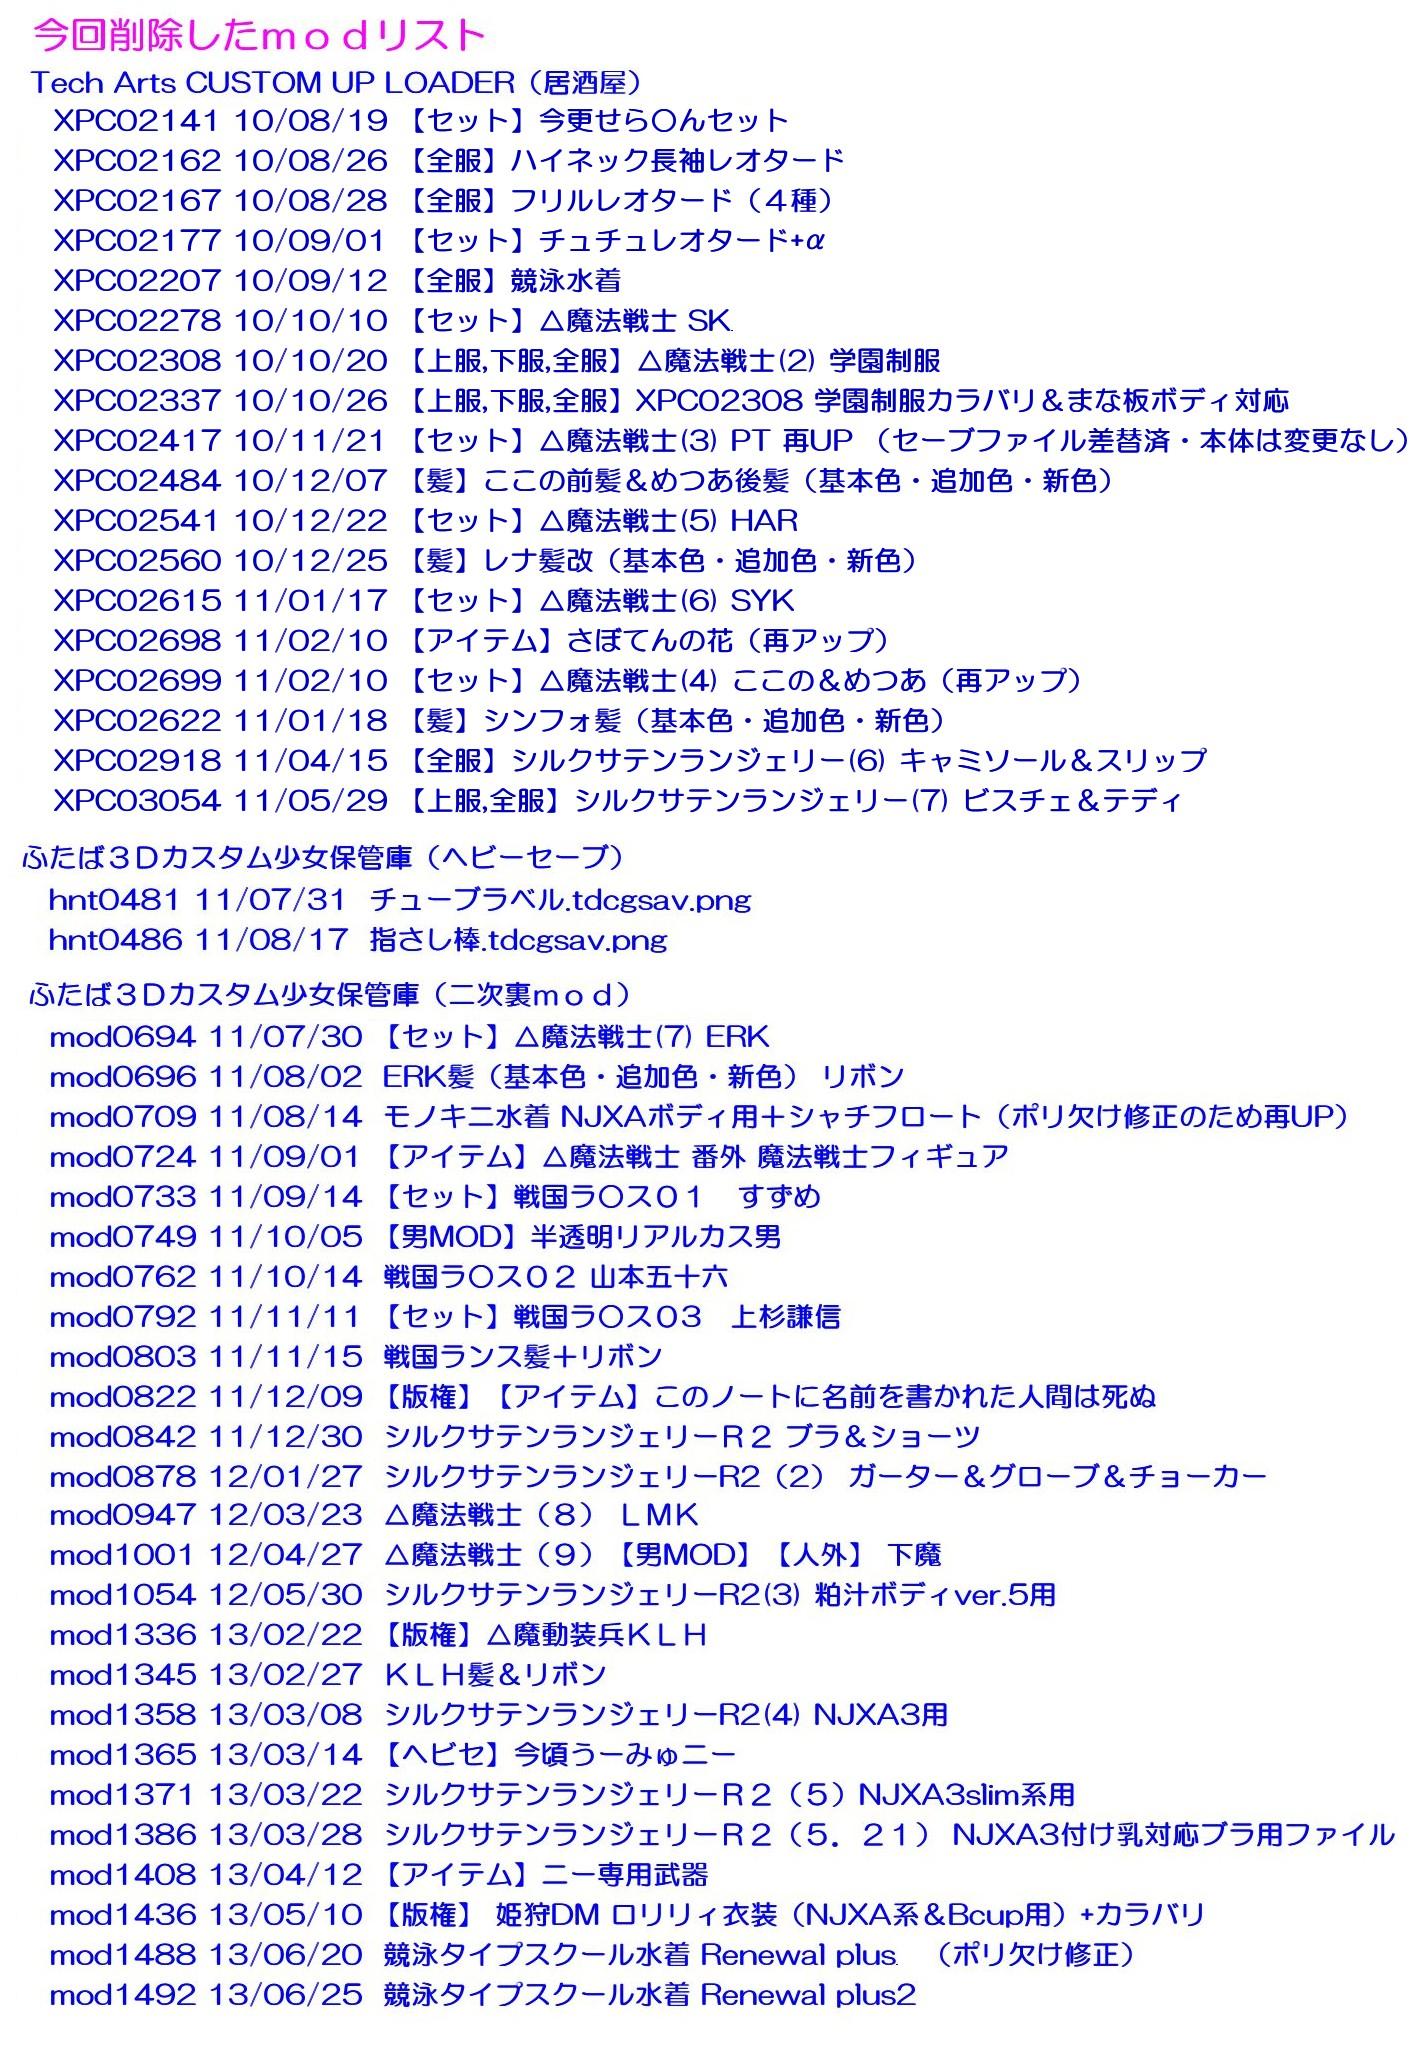 576.jpg - 1420x2050